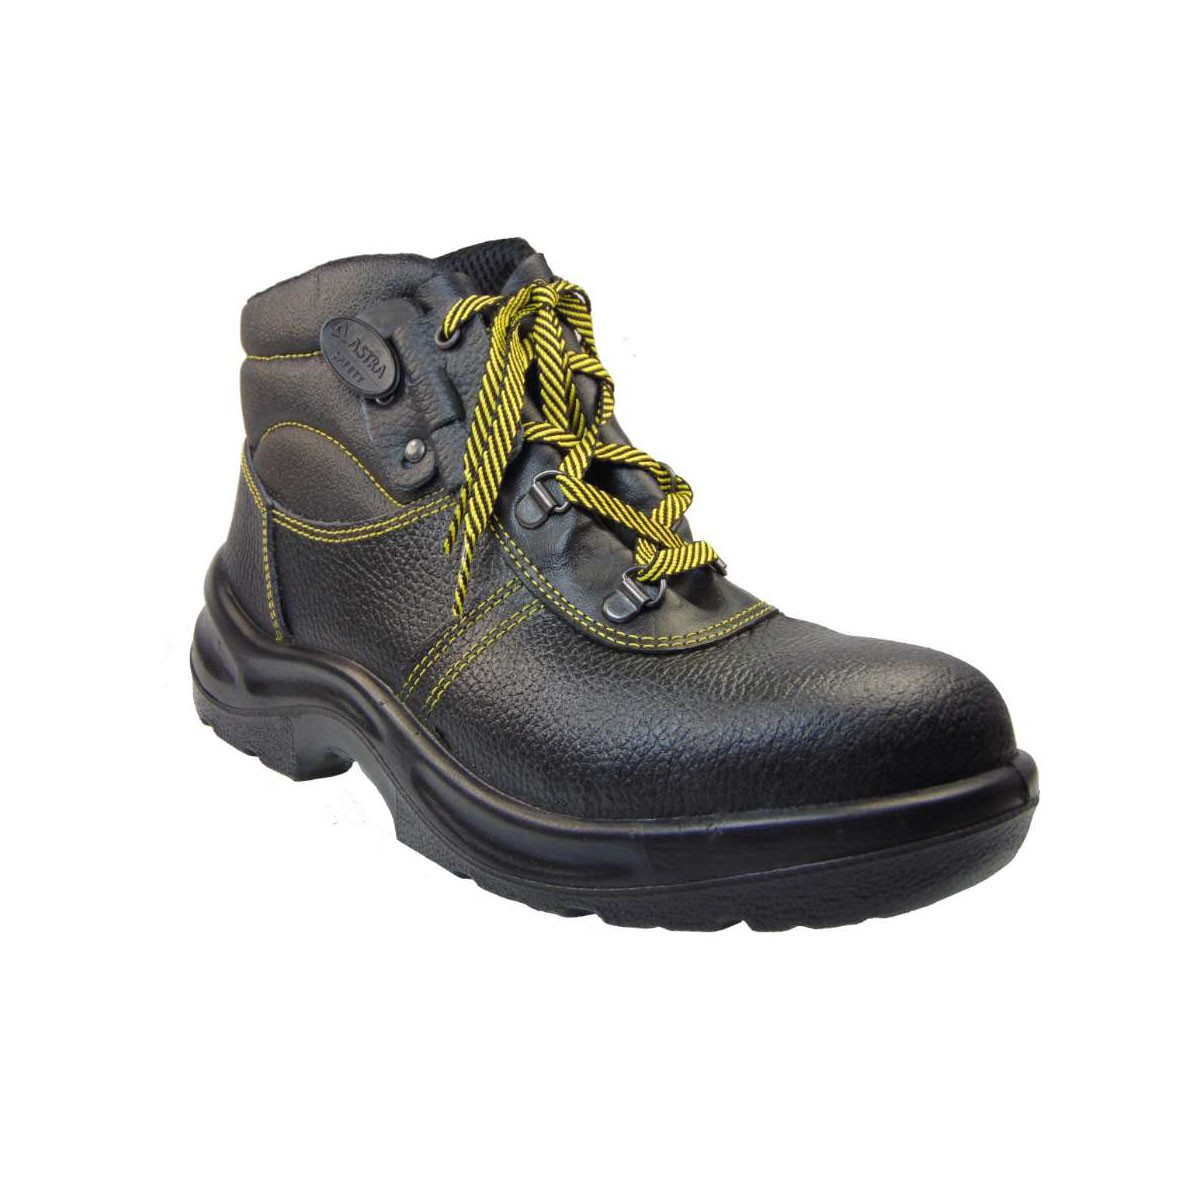 3f2197e4226 Tsimpolis Shoes 2512-S1P Μποτάκι Εργασίας Δερμάτινο Και Συνθετικό ...